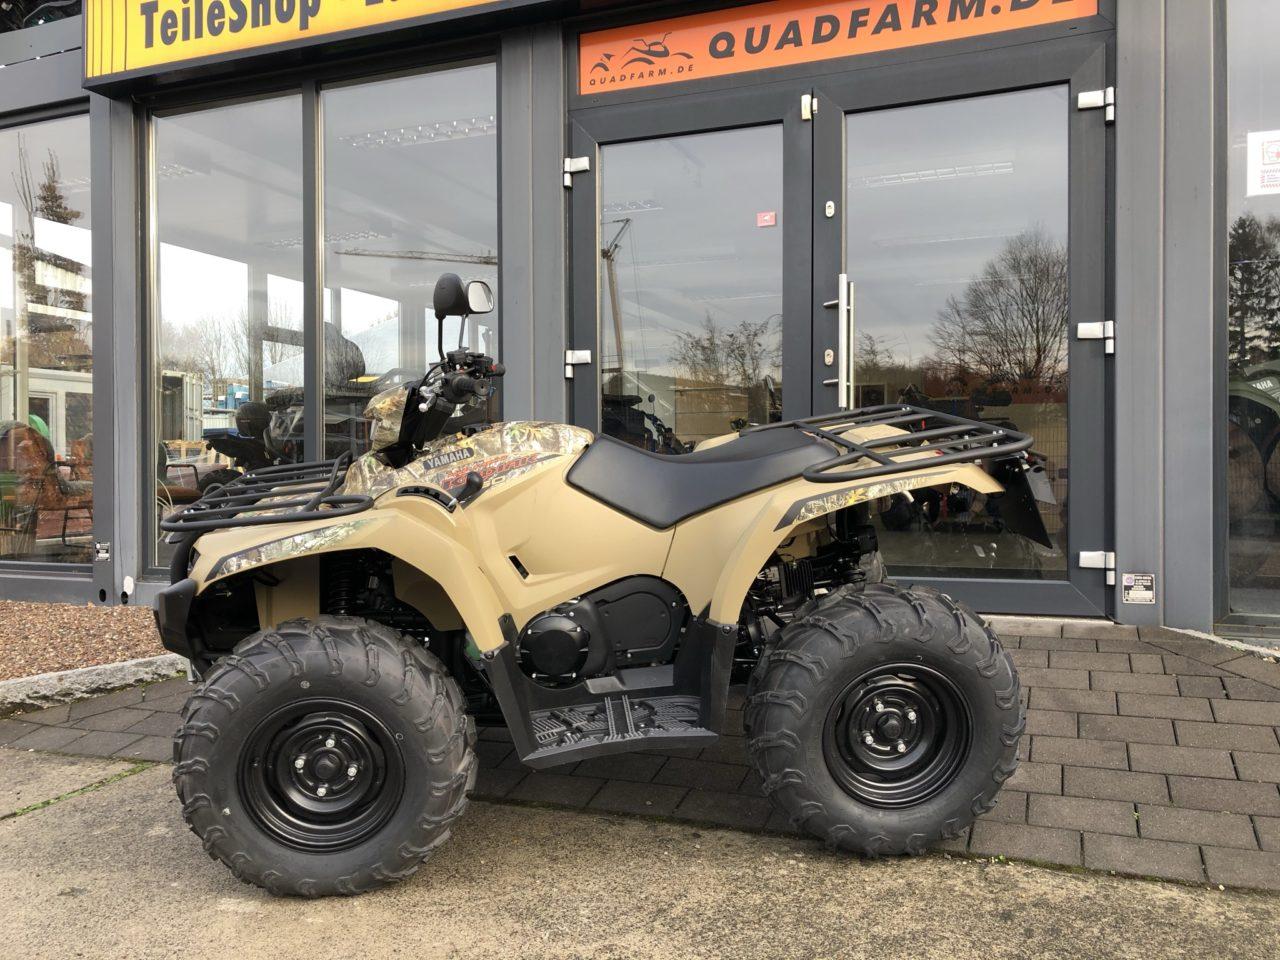 ATV / Quad Yamaha Kodiak 450, Servo, 38 PS, 421 ccm, inkl. LOF